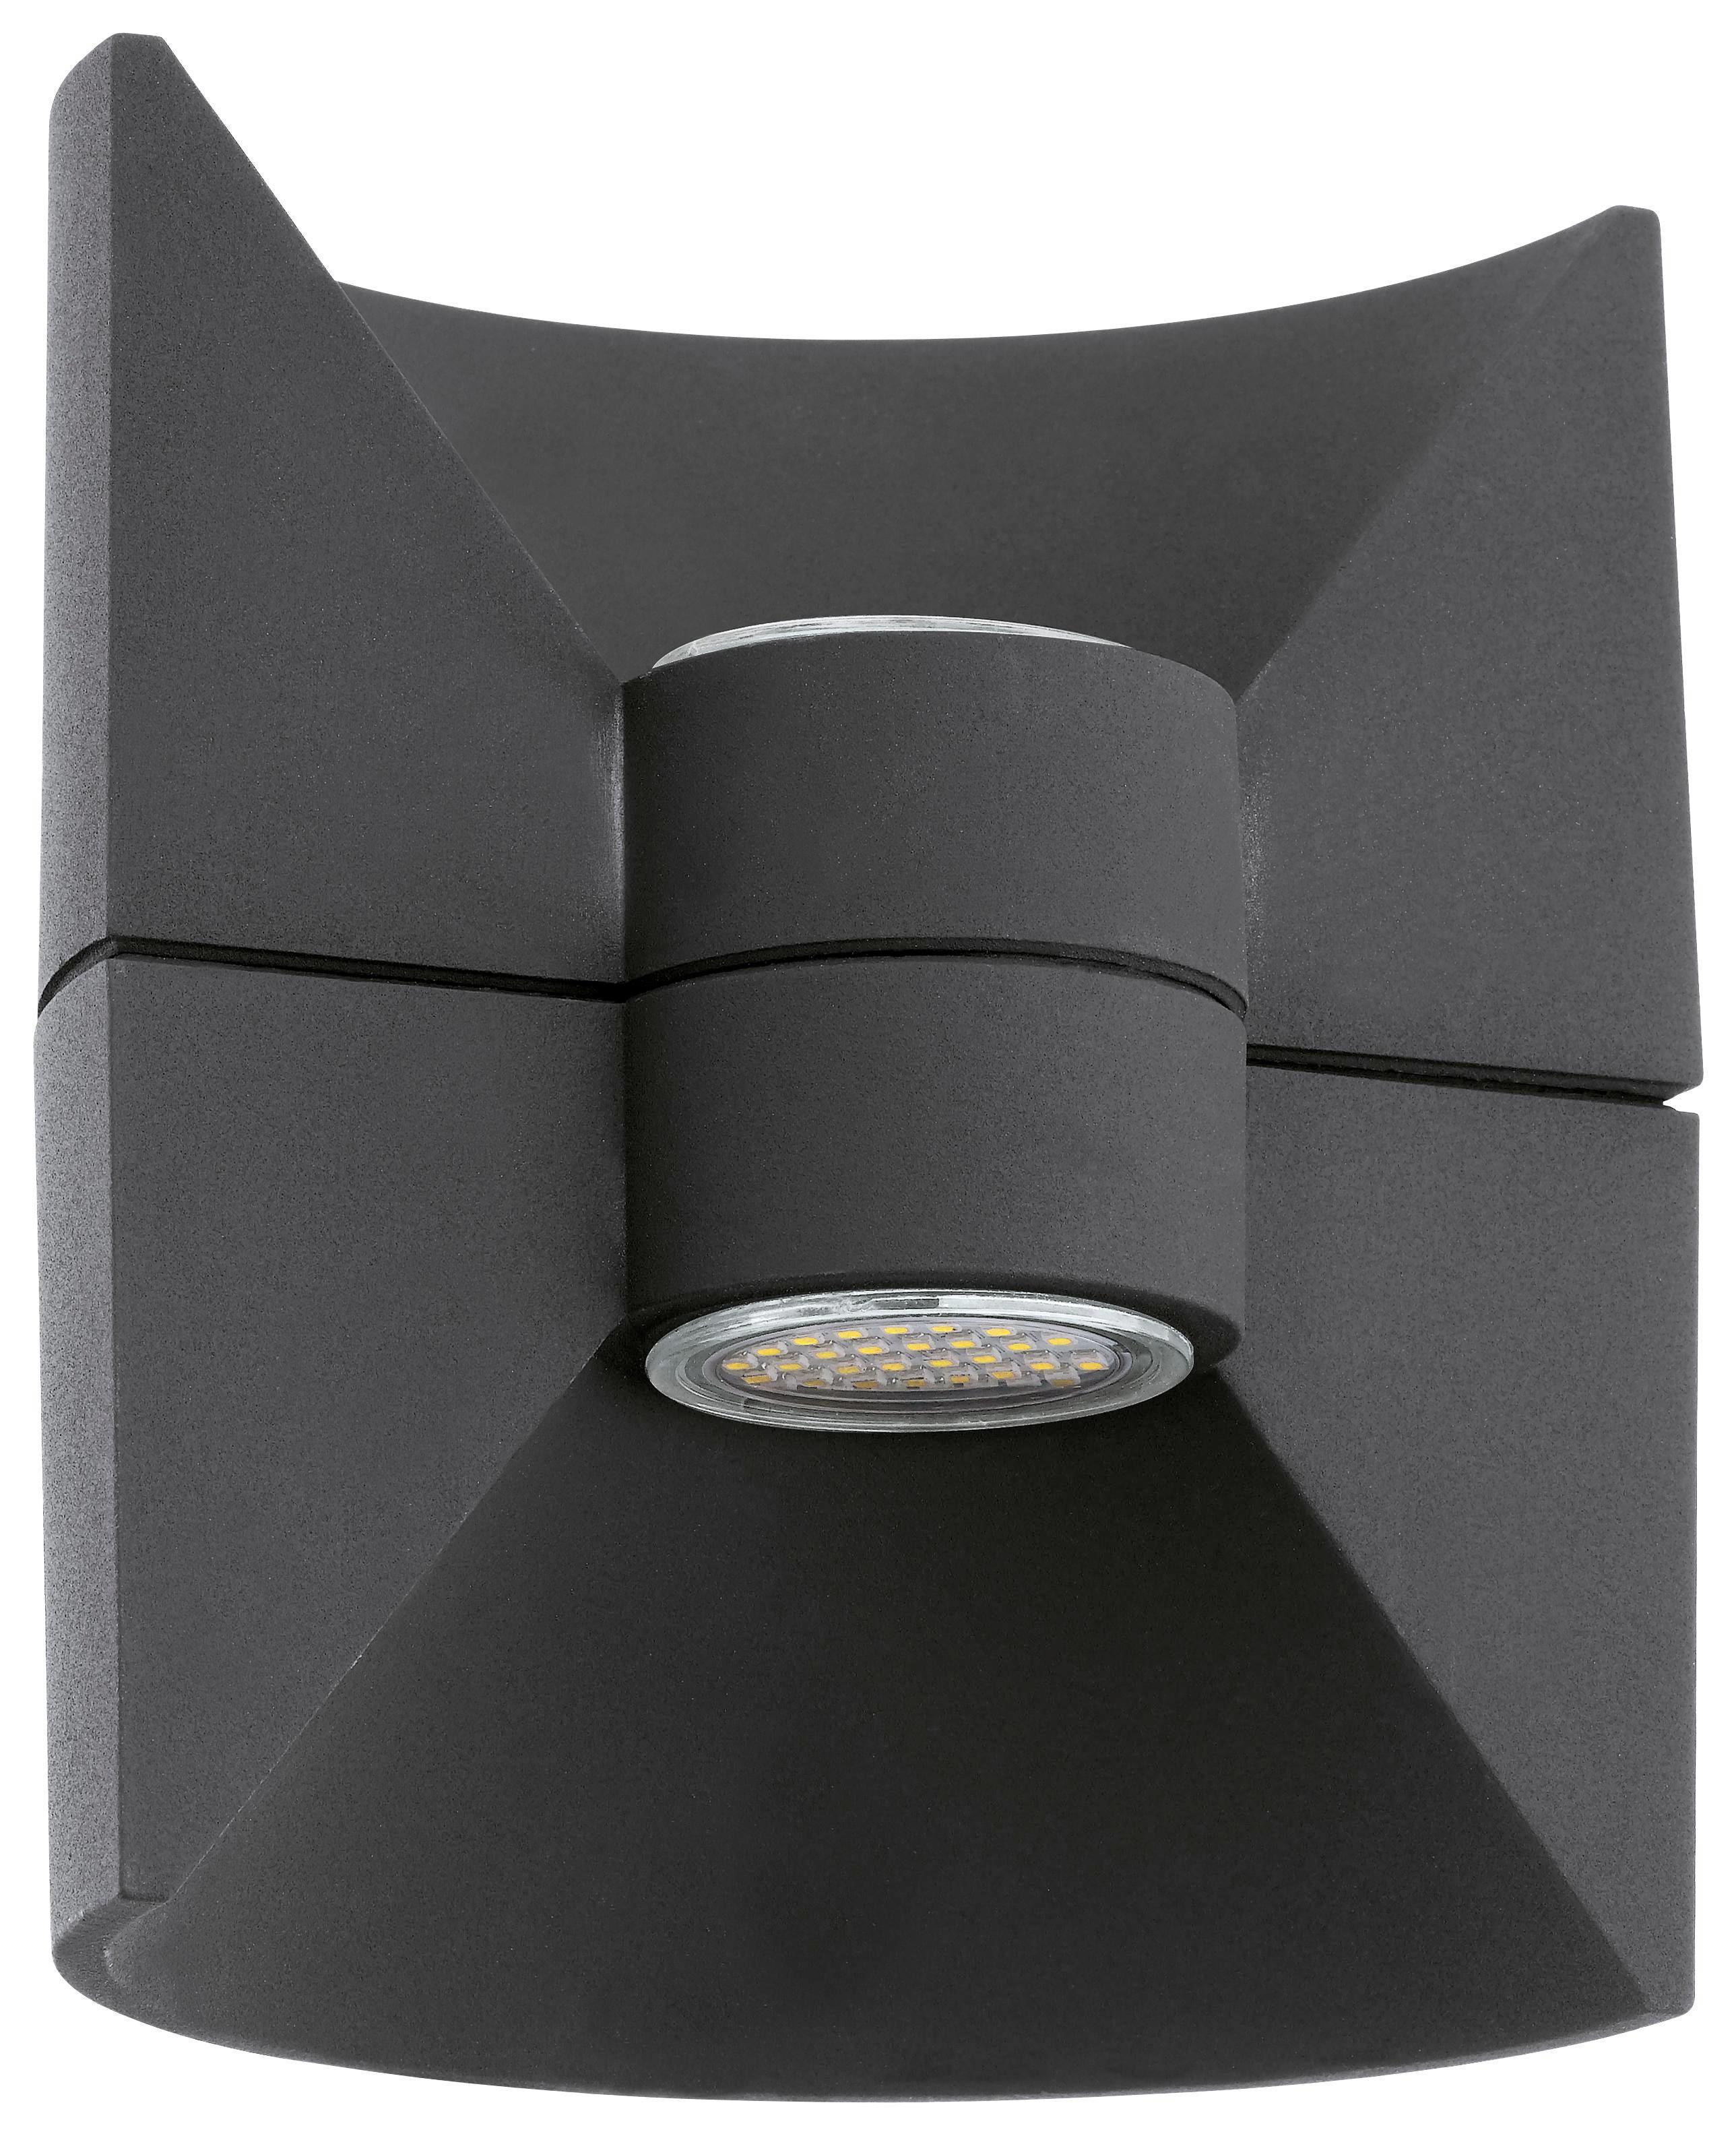 WANDLEUCHTE - Anthrazit, Design, Metall (16cm)